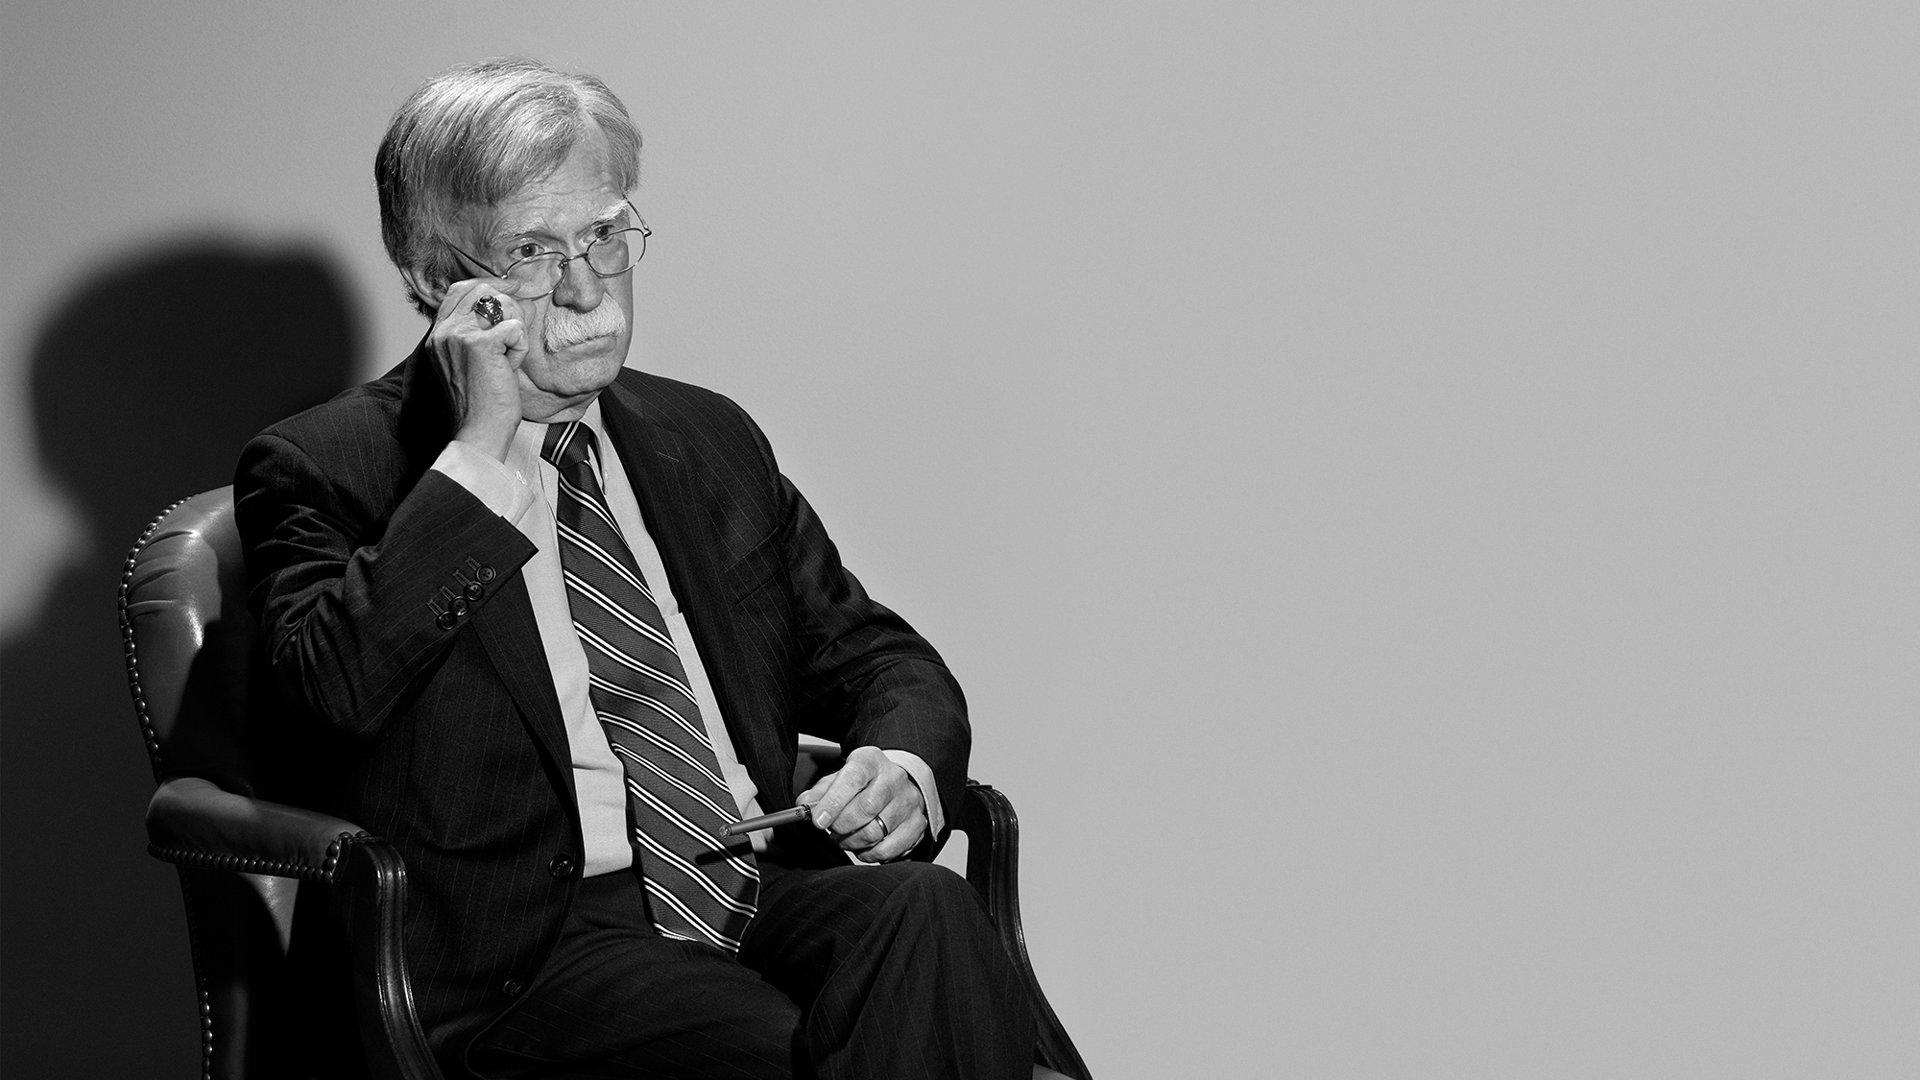 John Bolton Trump S Shrewd National Security Adviser The